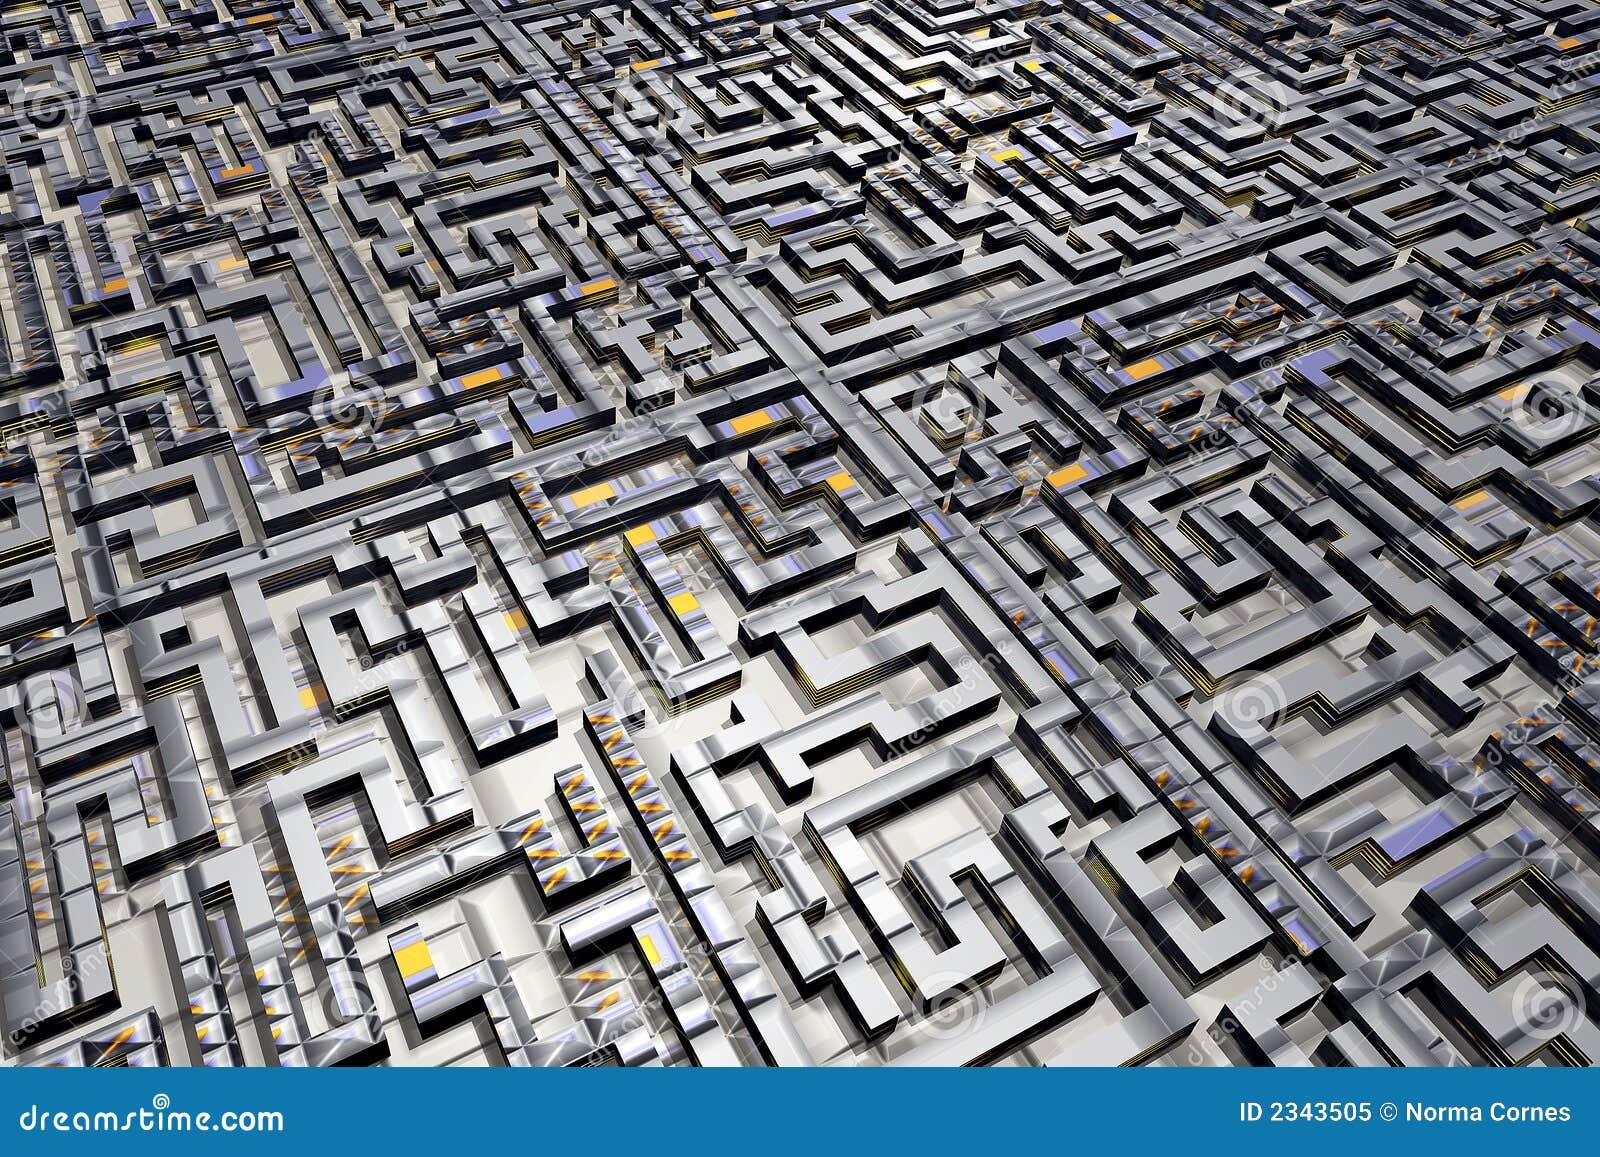 Labyrinth City Maze Royalty Free Stock Photo - Image: 2343505